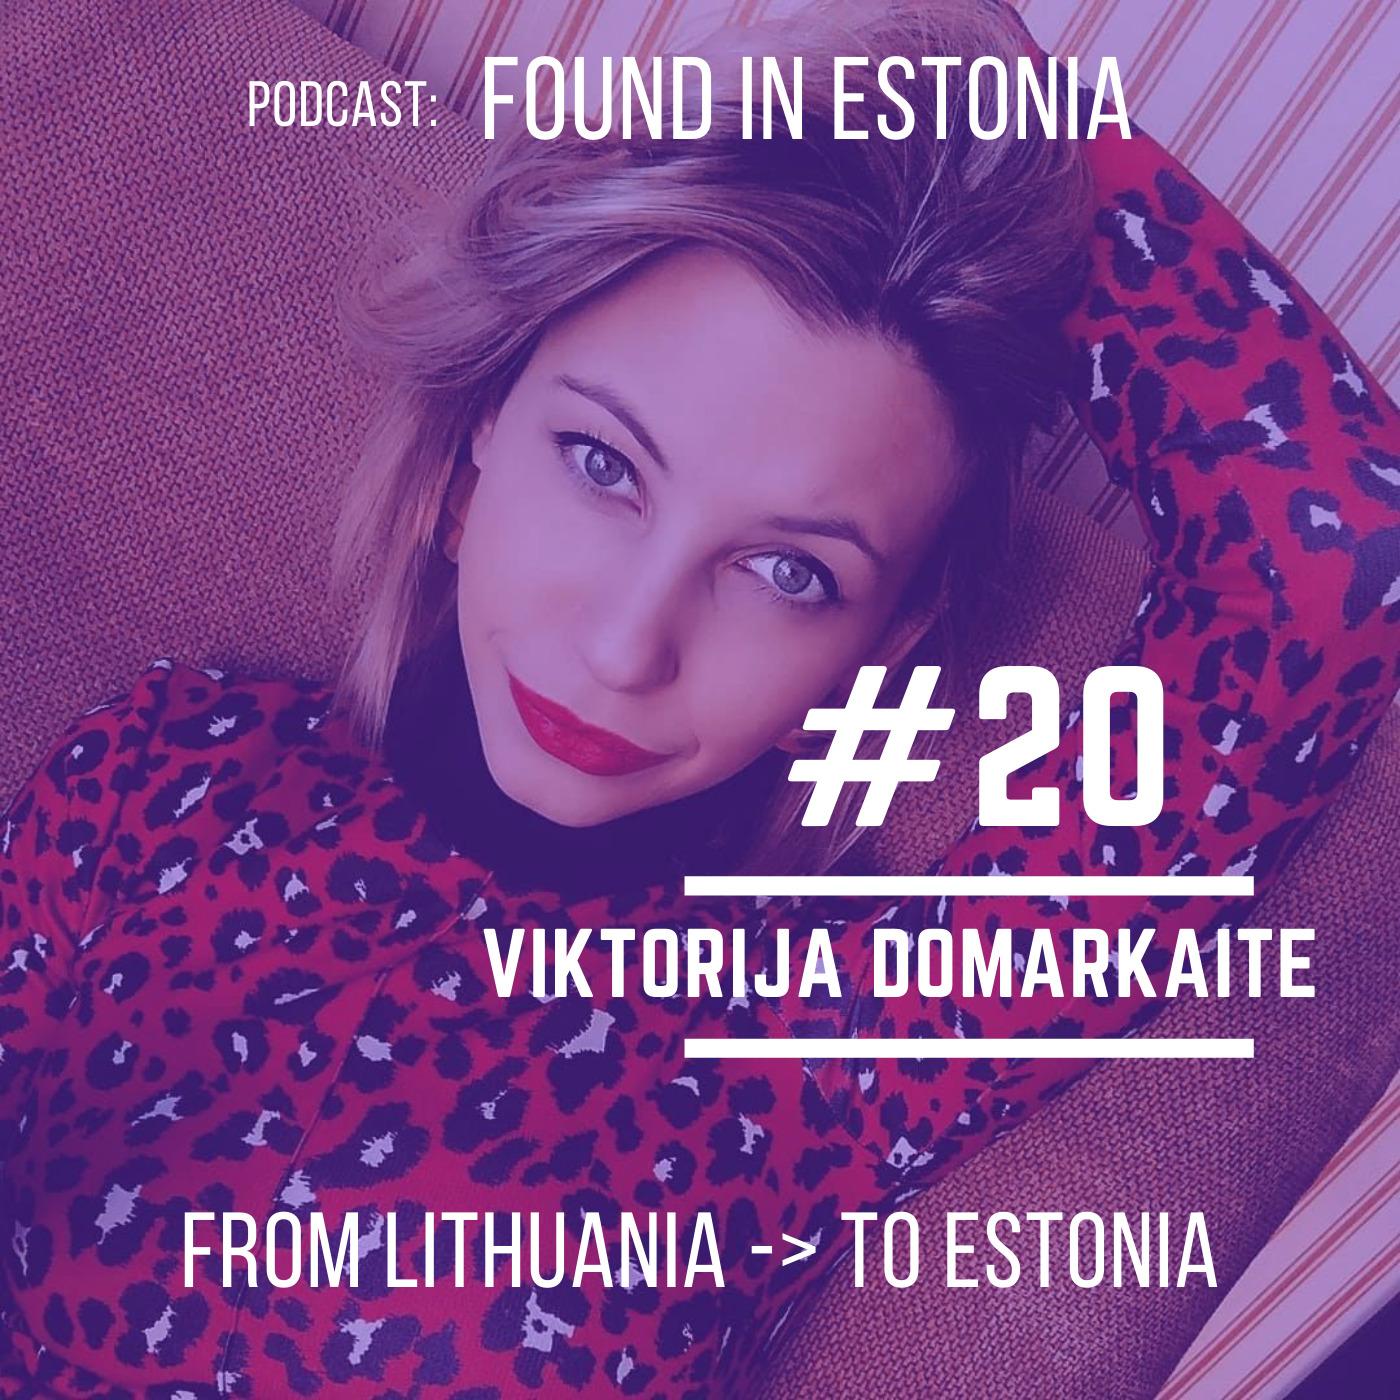 #20 Viktorija Domarkaite from Lithuania to Estonia